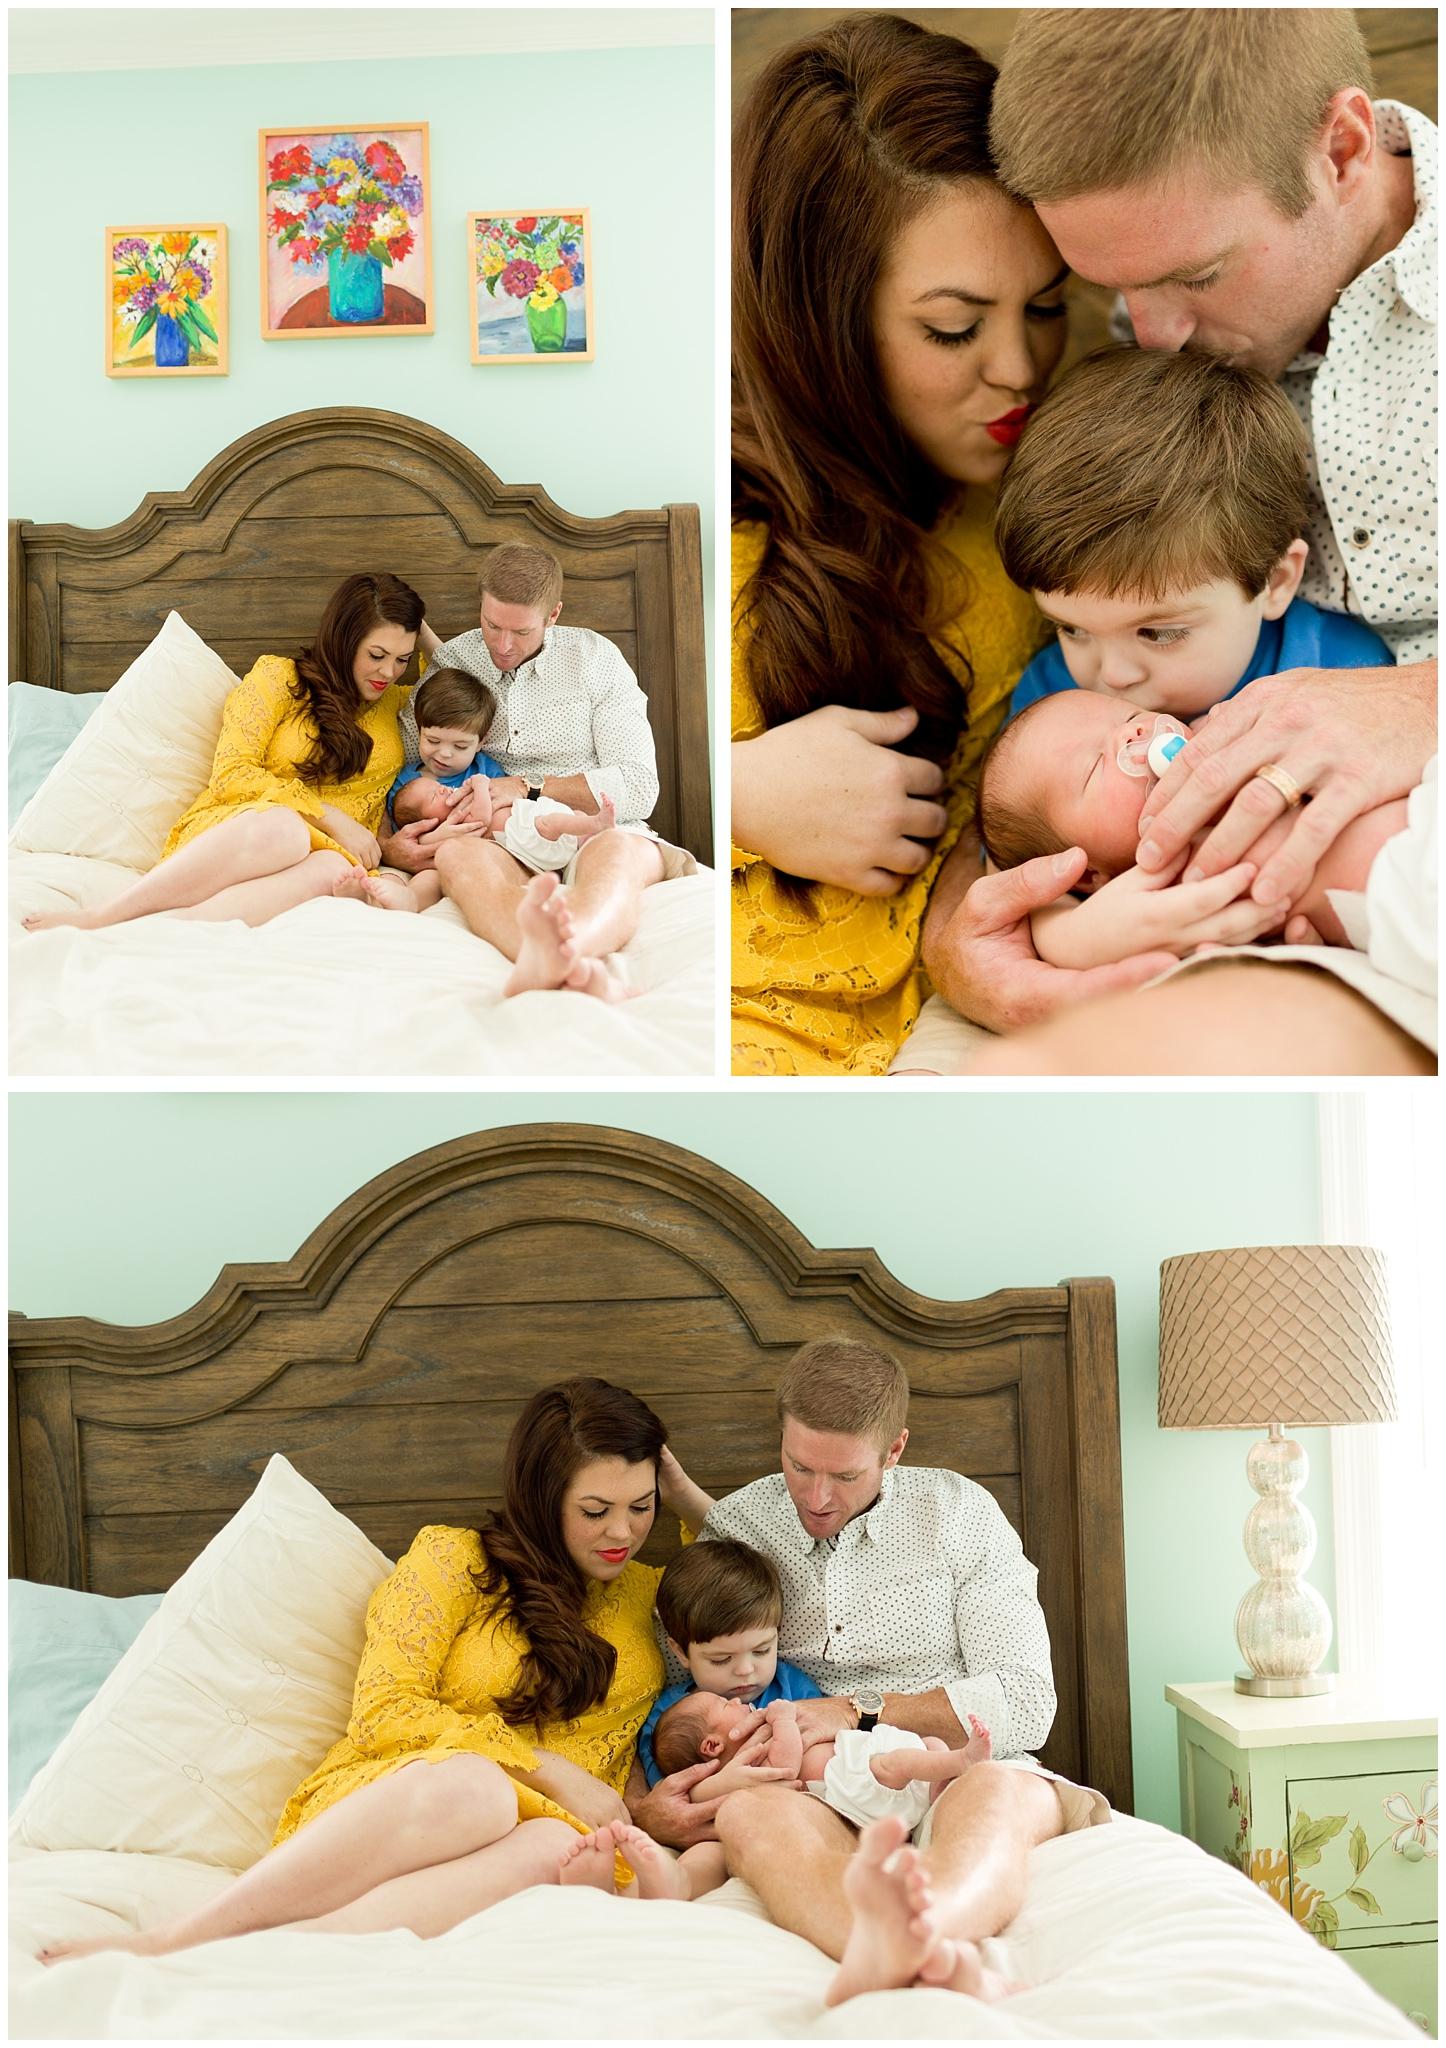 family portraits with newborn baby boy